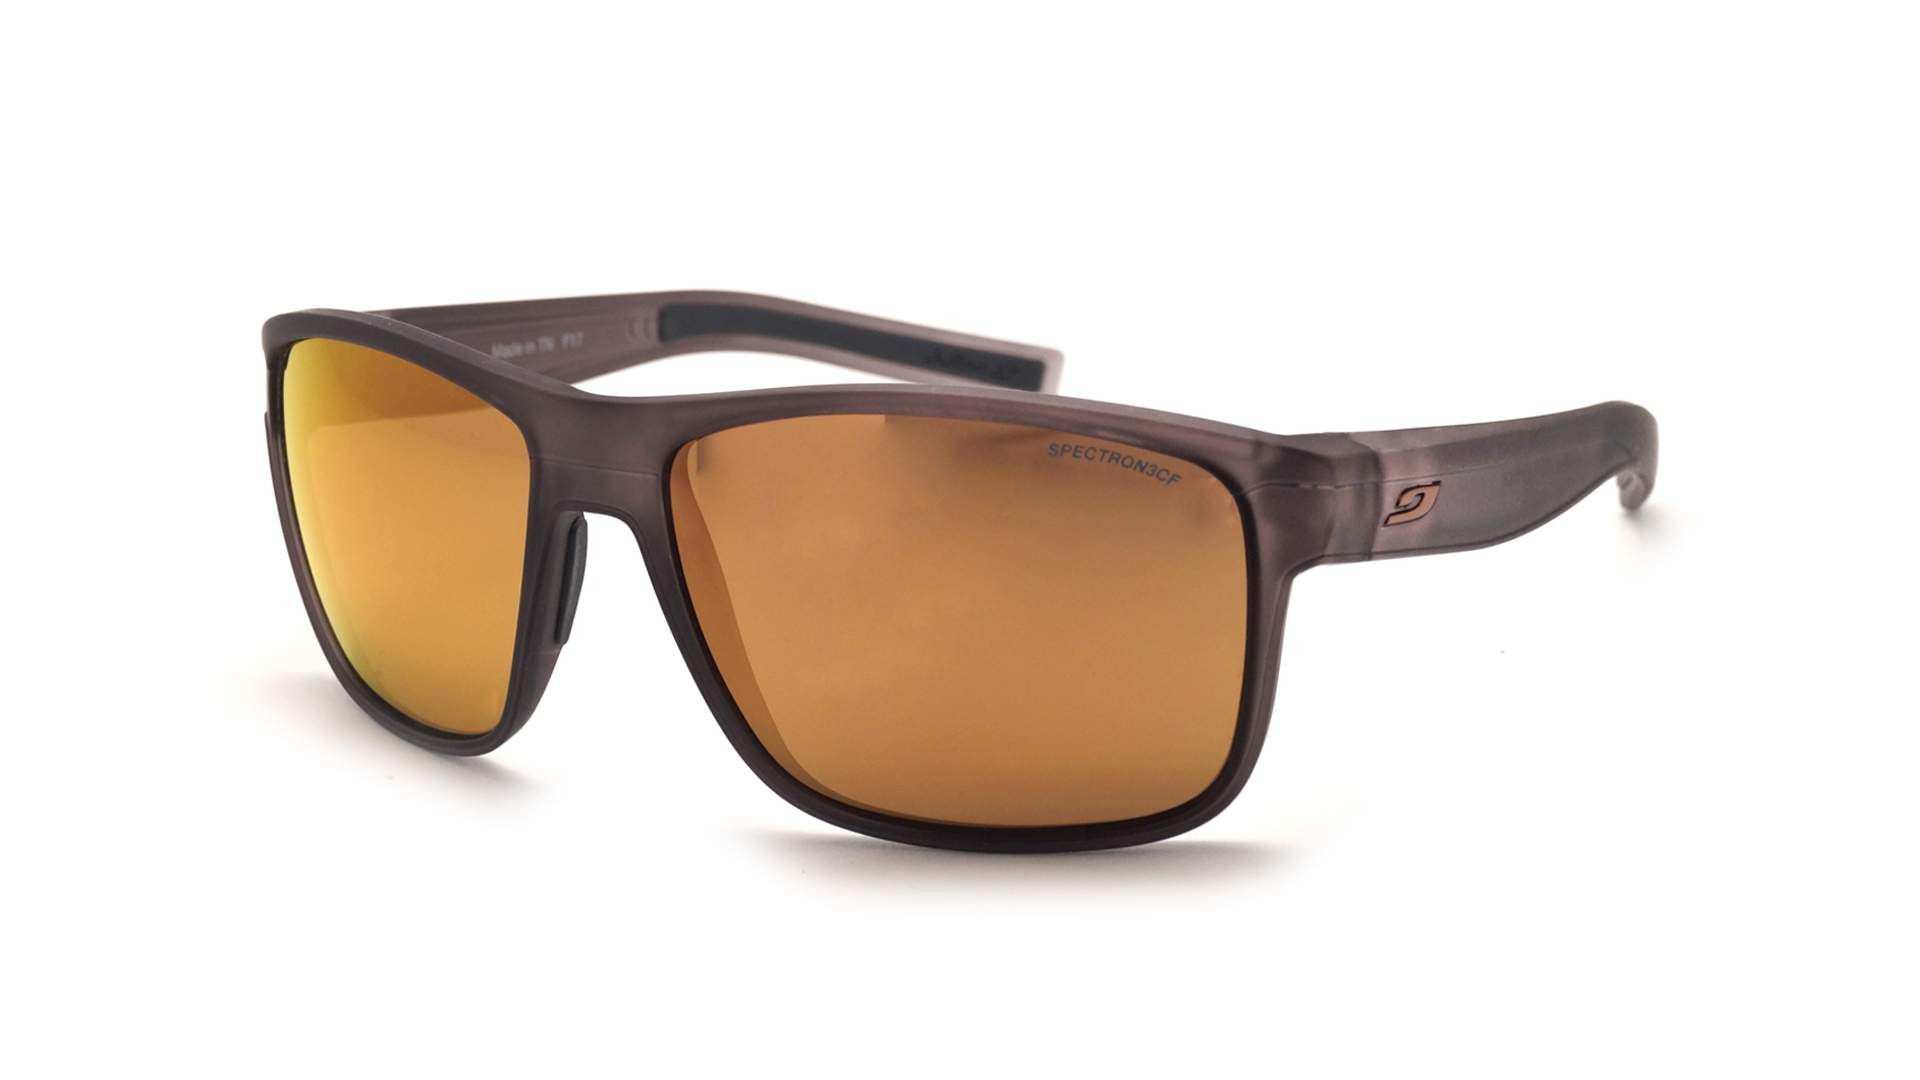 d33636e087 Sunglasses Julbo Renegade Grey Matte J499 1114 59-17 Large Mirror